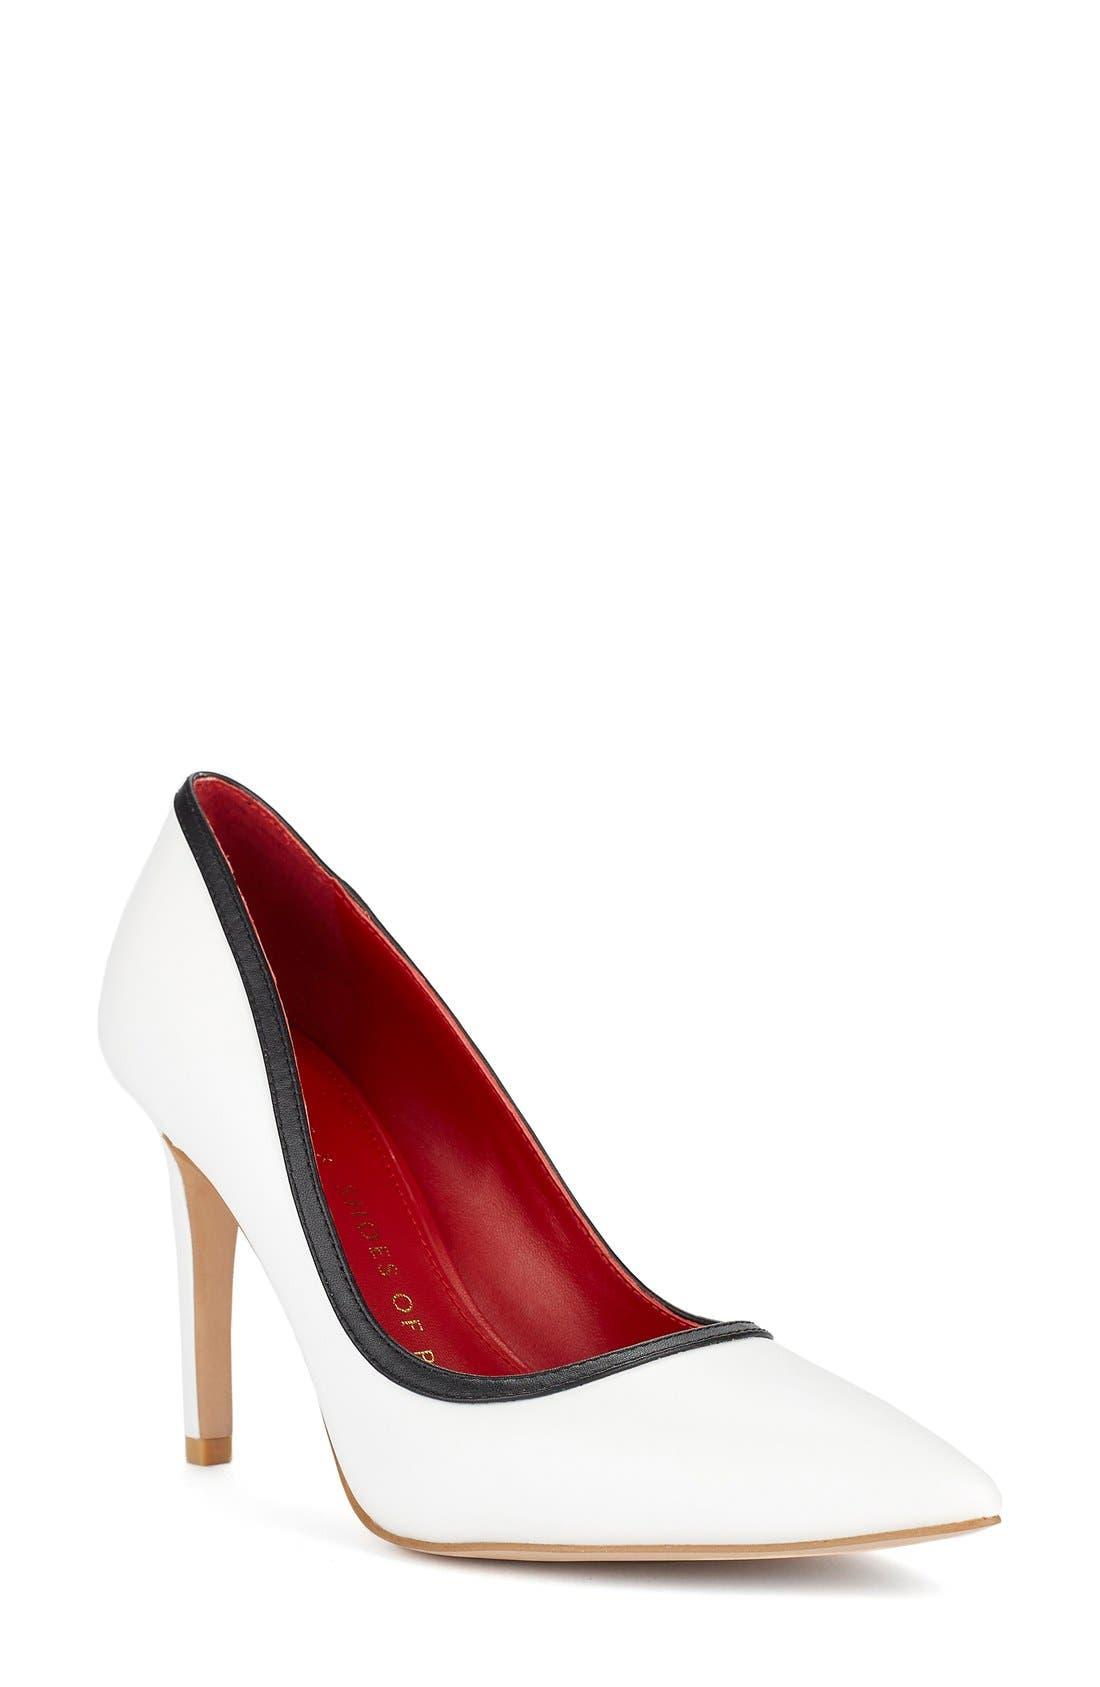 Main Image - Shoes of Prey x Kim Jones La Dolce Vita Collection Pointy Toe Pump (Women)